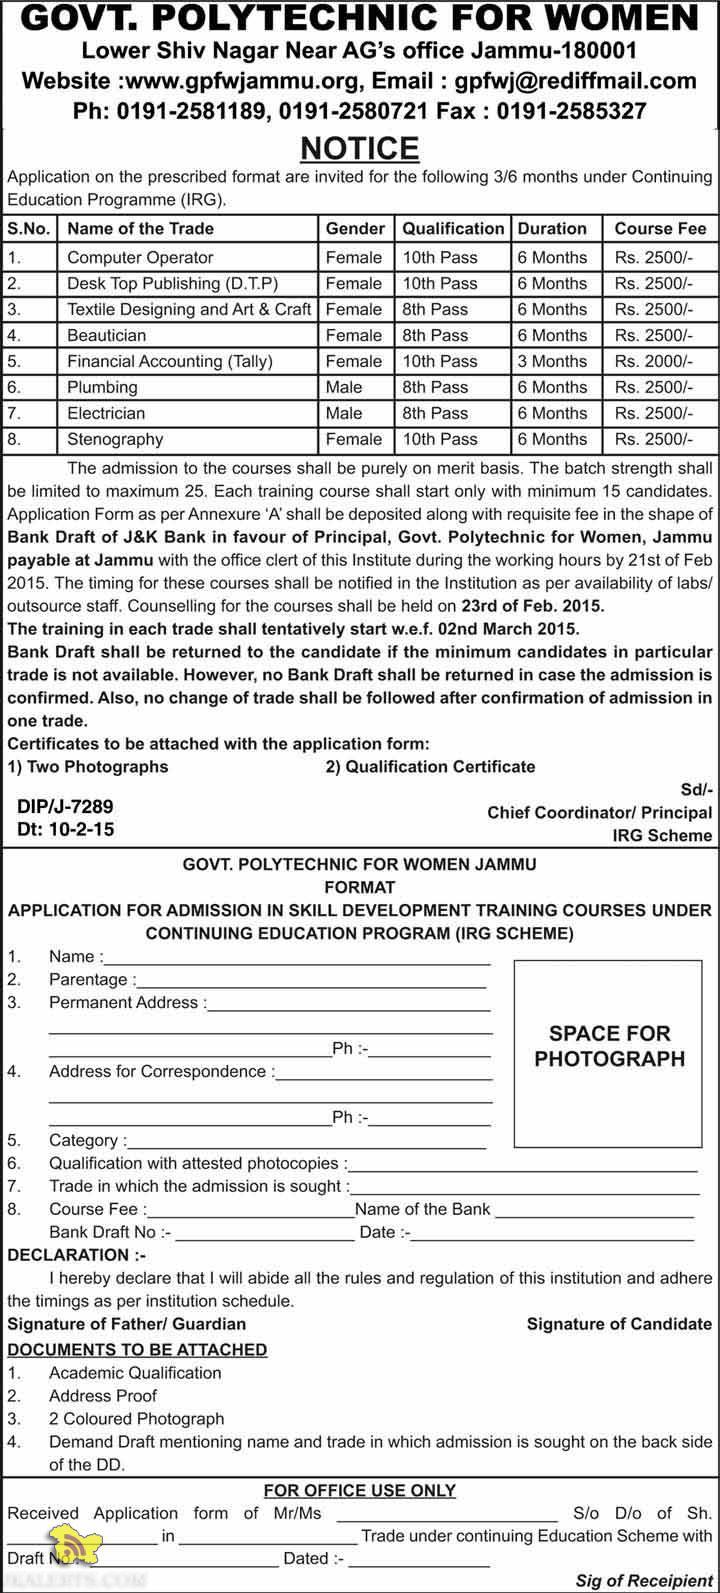 Admission in GOVT. POLYTECHNIC FOR WOMEN